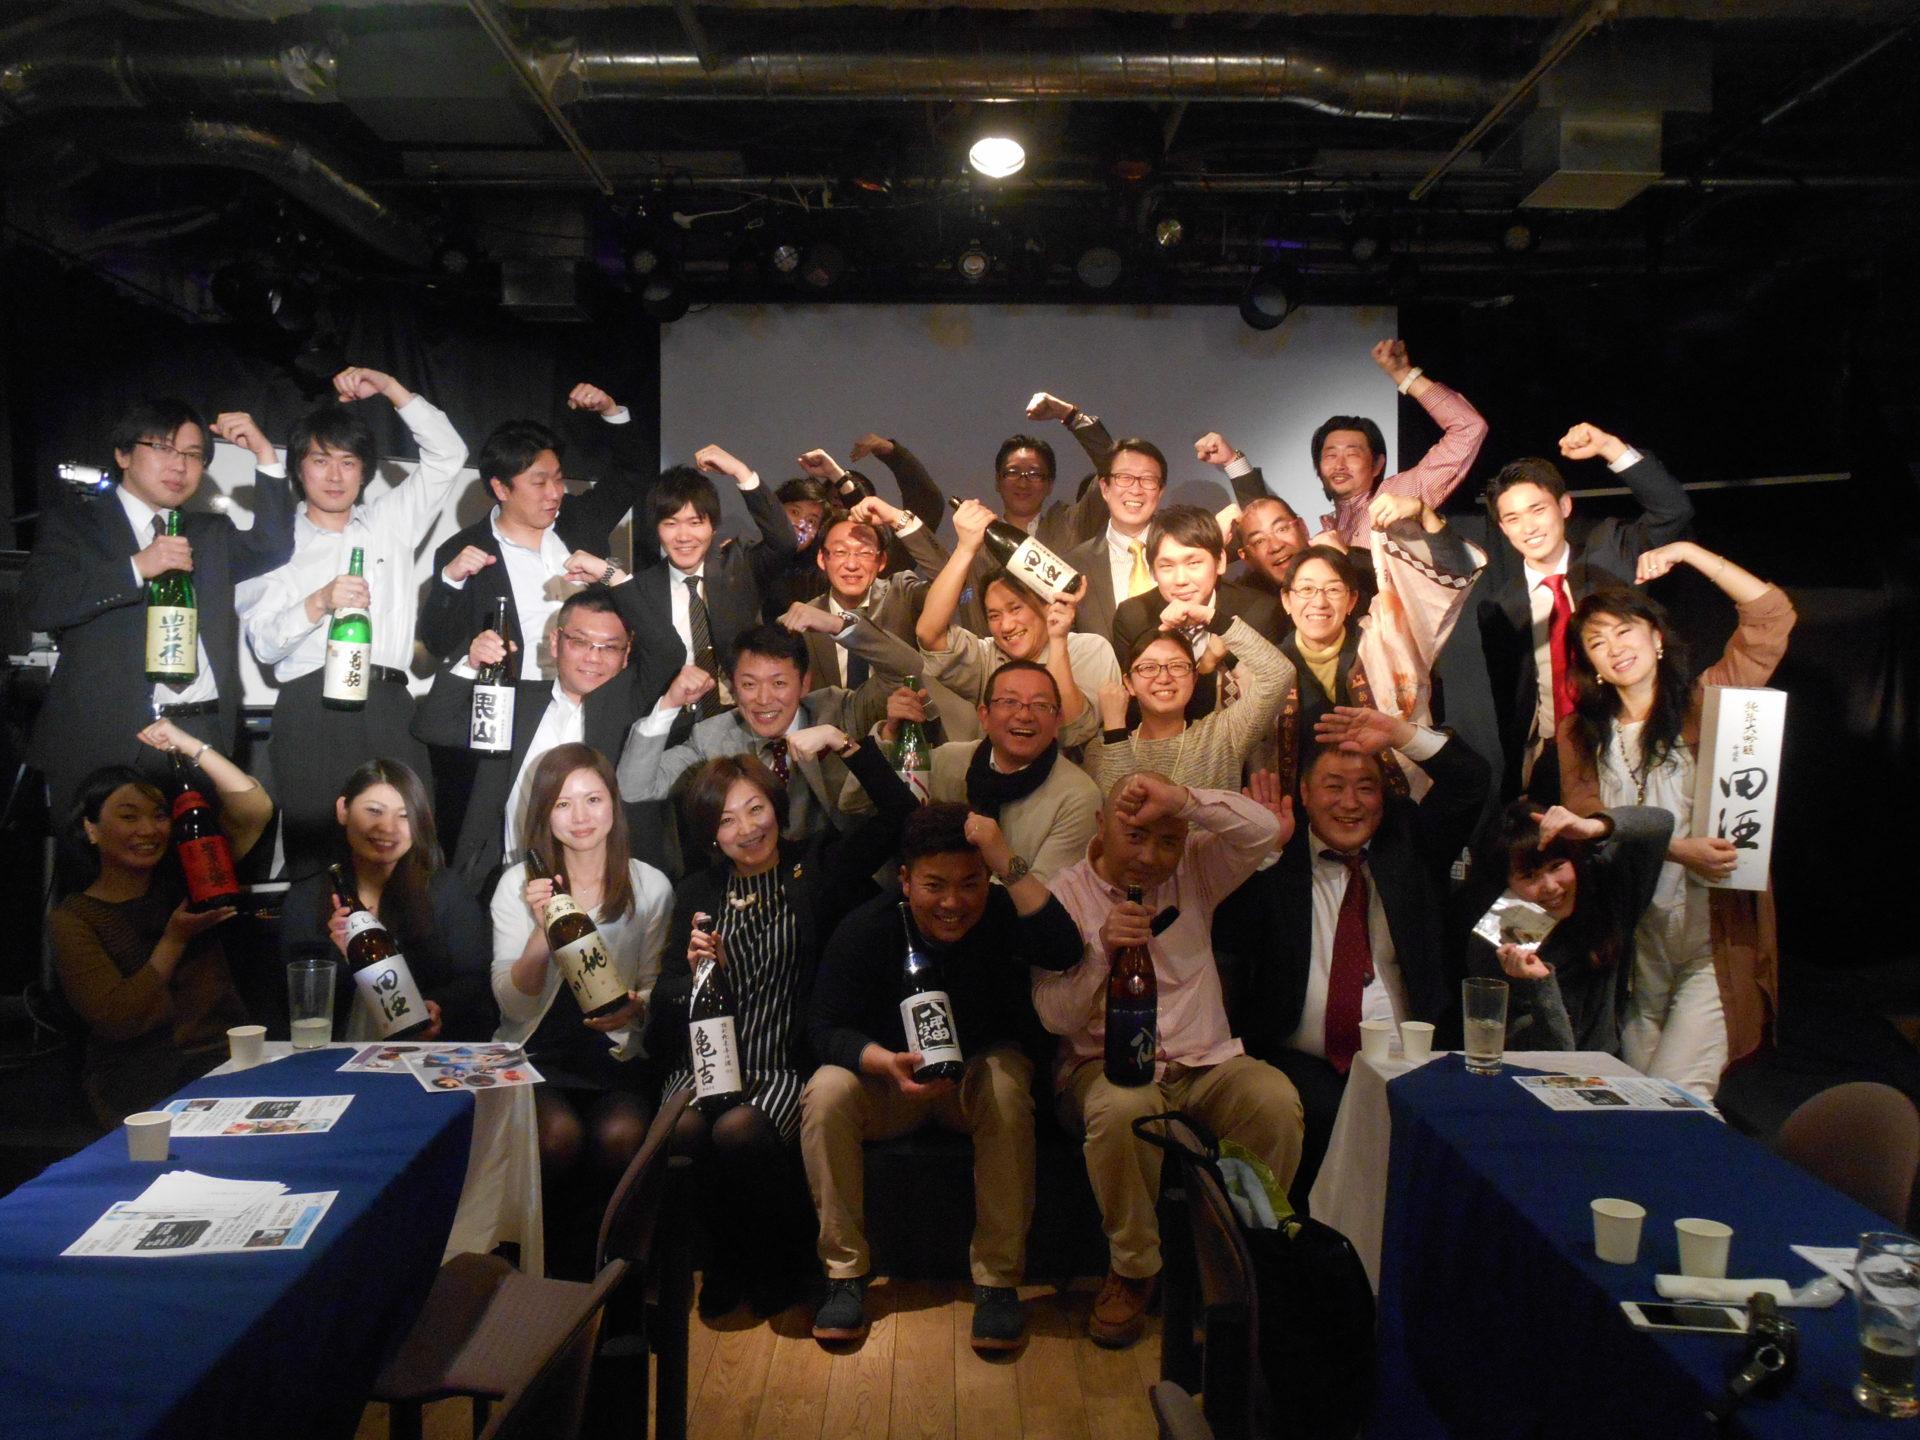 DSCN1100 1 1920x1440 - 2016年3月11日(金)AOsuki総会&パーティー開催しました。